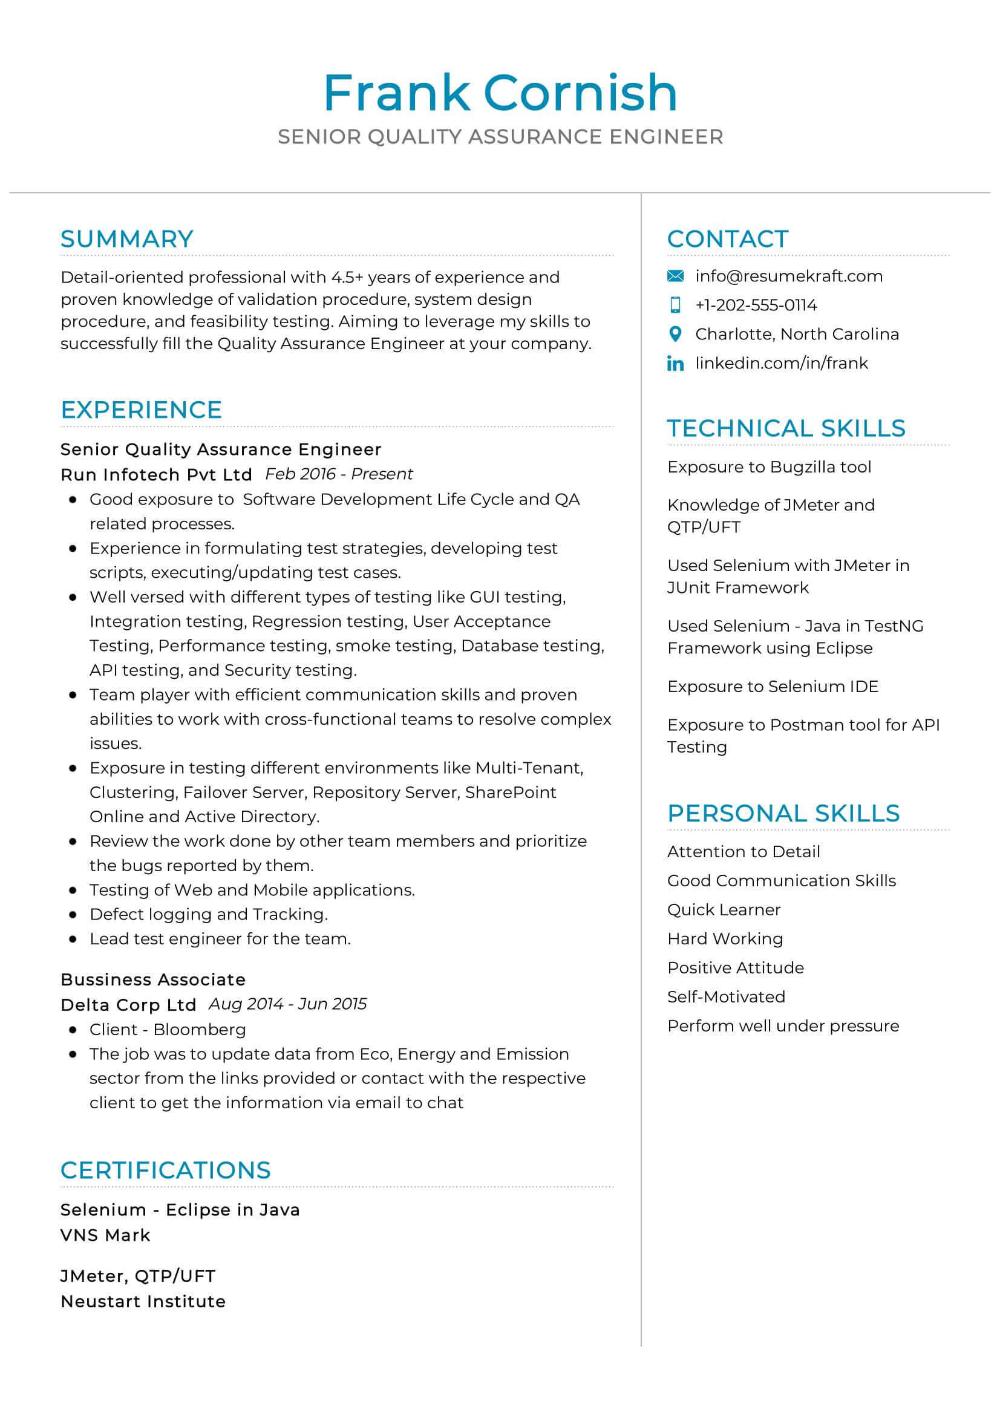 100 Professional Resume Samples For 2020 Resumekraft Teaching Resume Professional Resume Samples Resume